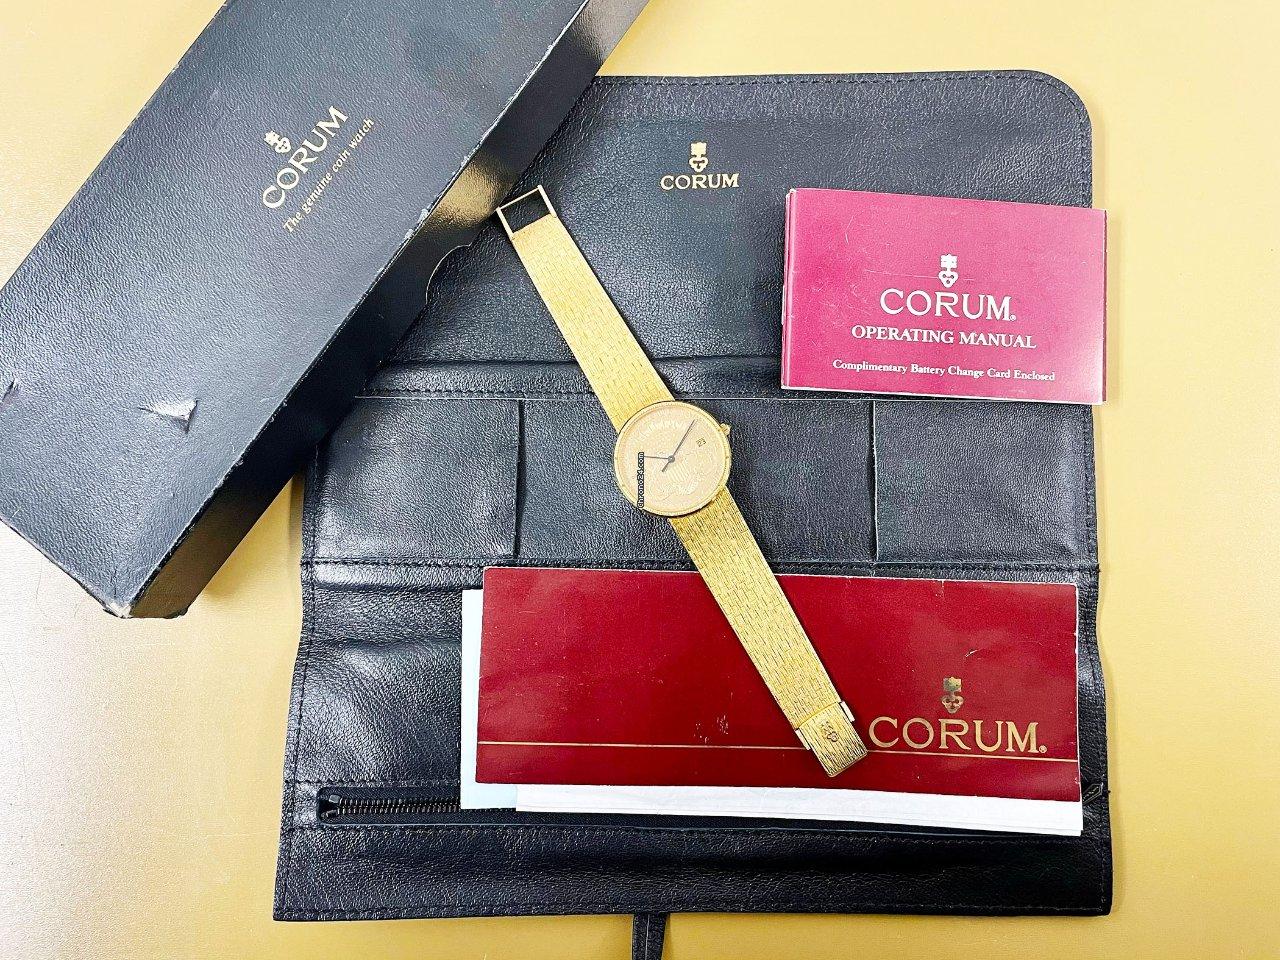 Corum Coin Watch 293.645.56/0001 MU51 1986 pre-owned